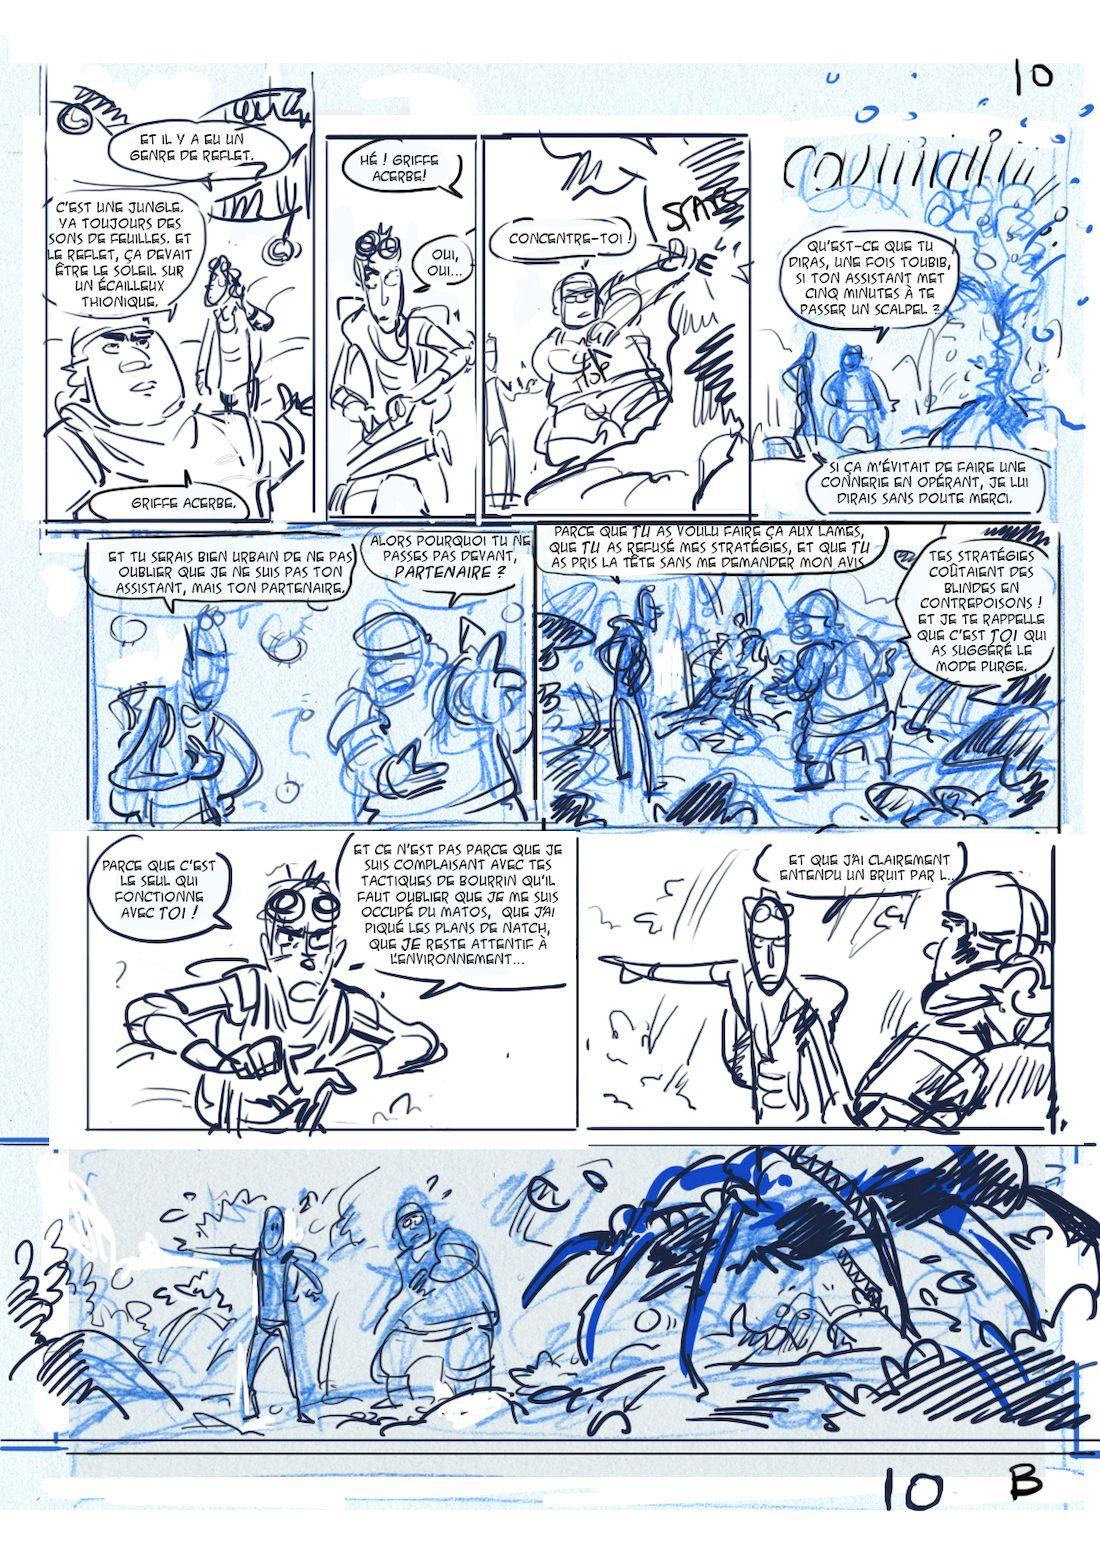 Dragon & Poisons, storyboard de la planche 10, version B © Morse / Bauthian